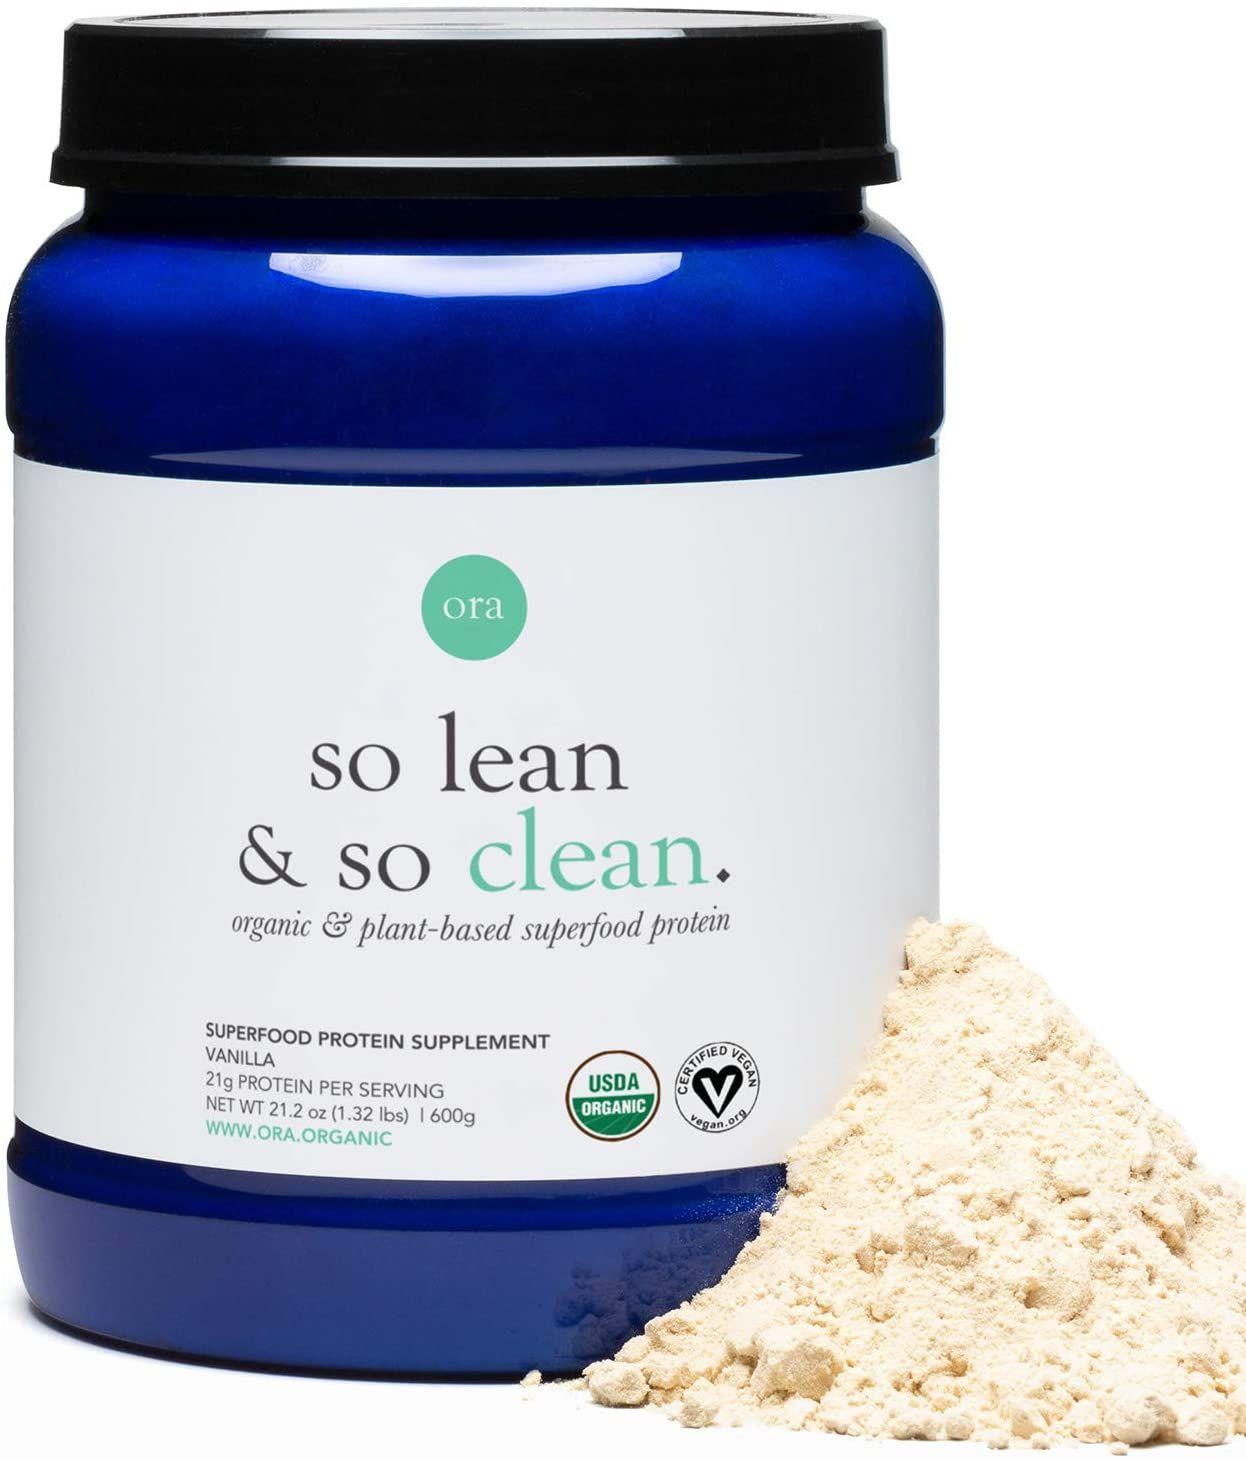 Organic Vegan Protein Powder In 2020 Organic Vegan Protein Powder Vegan Protein Powder Plant Based Protein